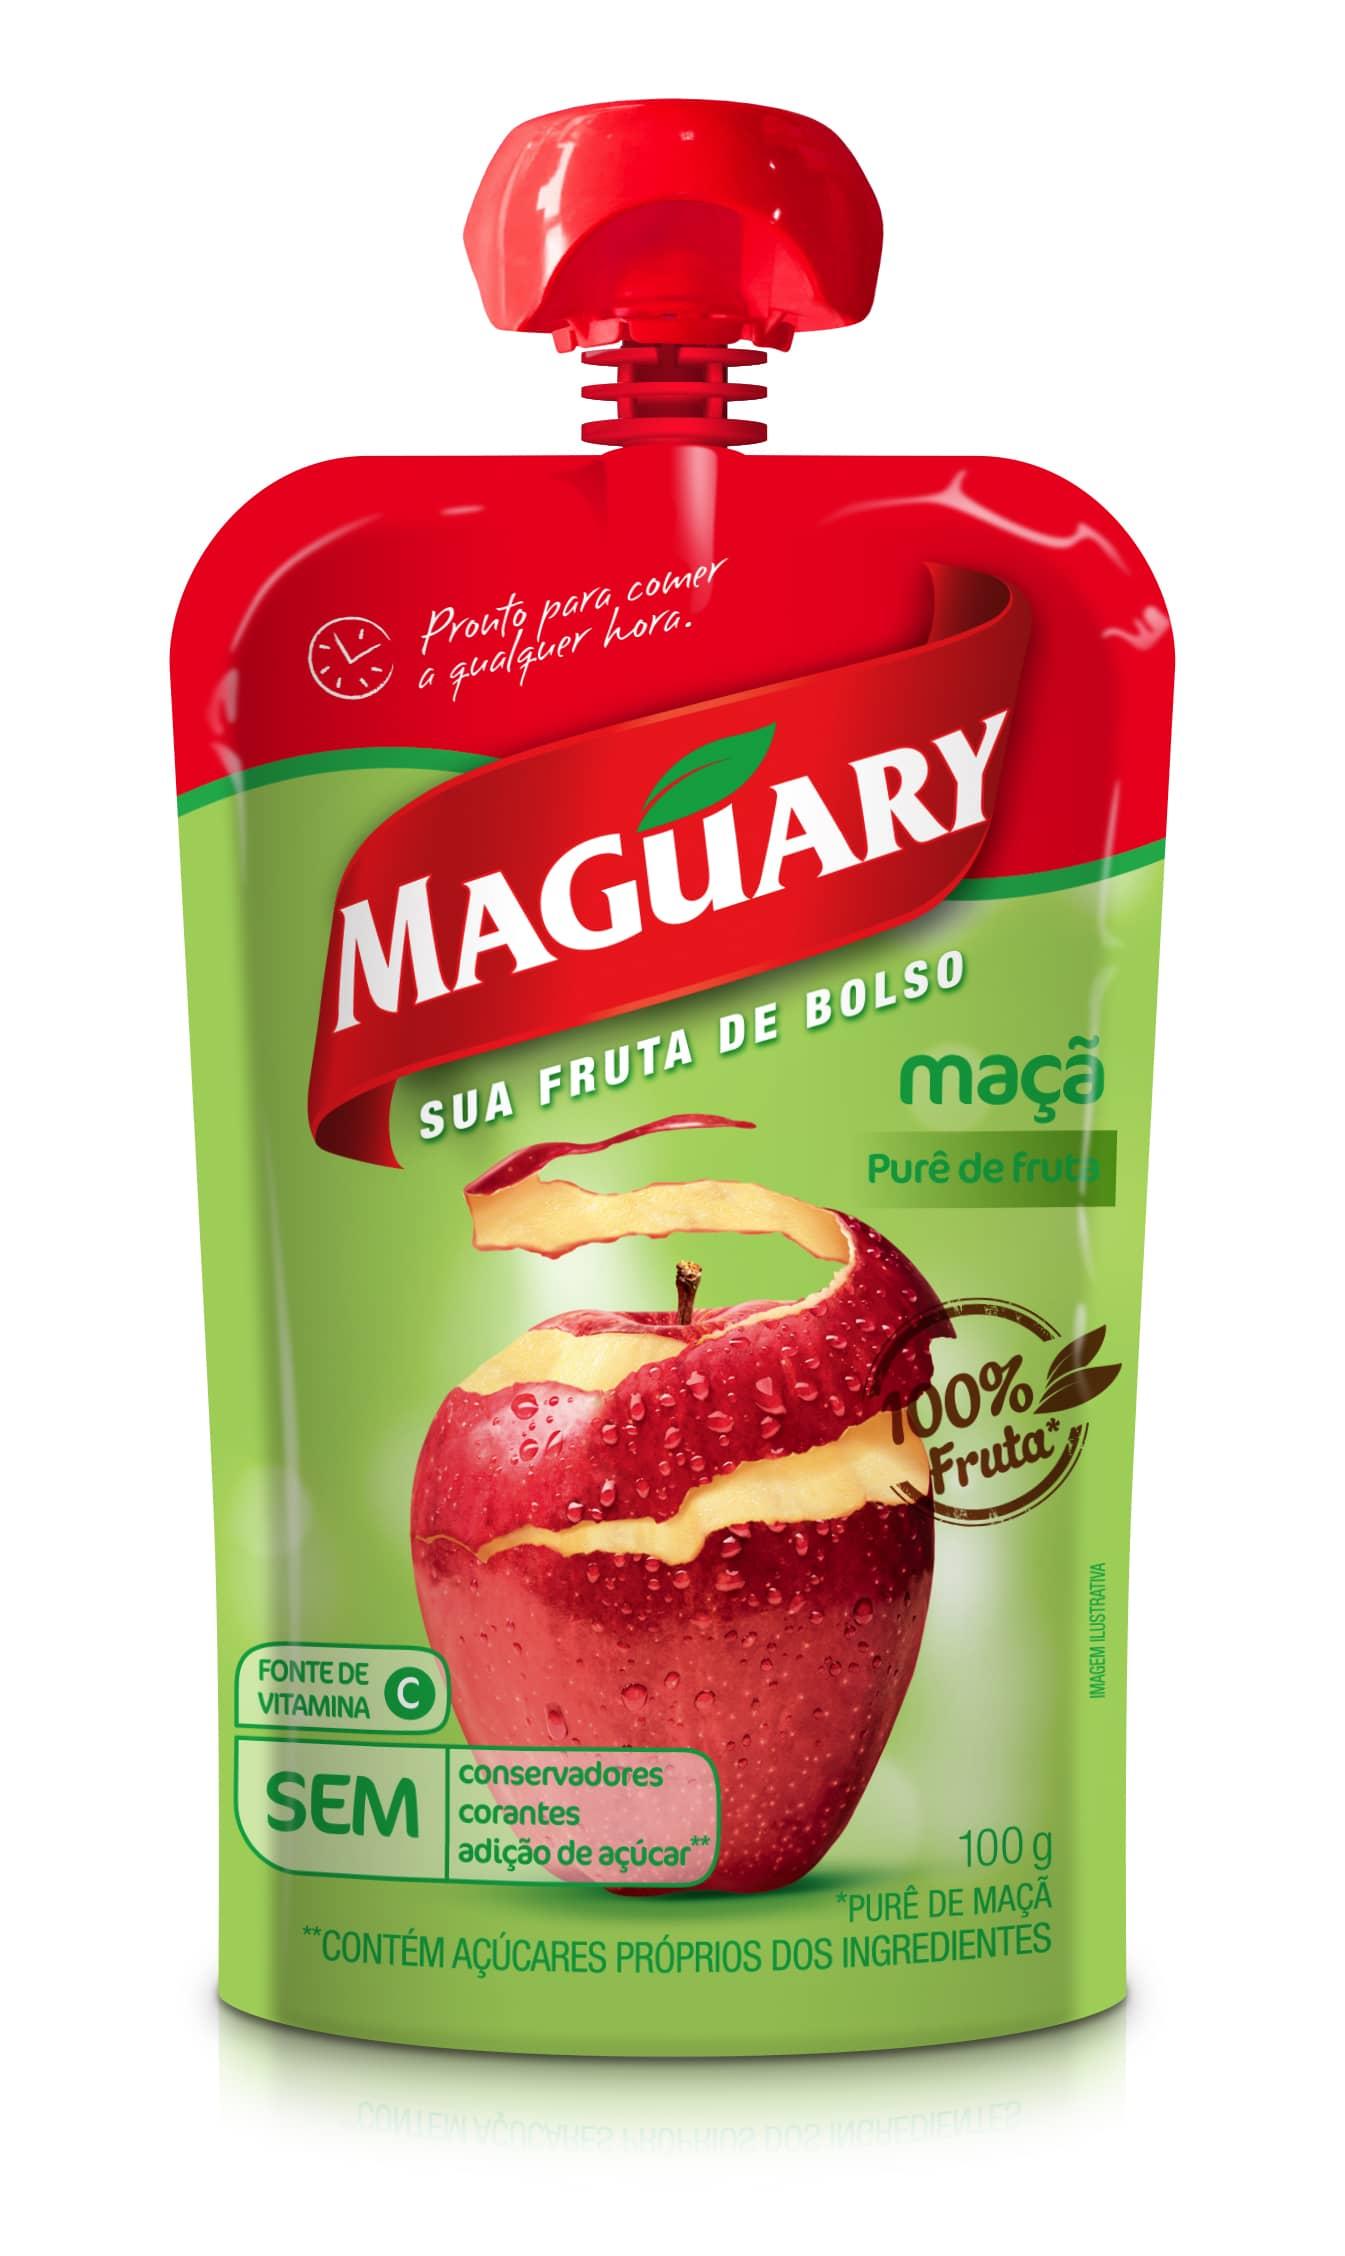 AF_Maguary_Mockup_Pure_Maca_1408131